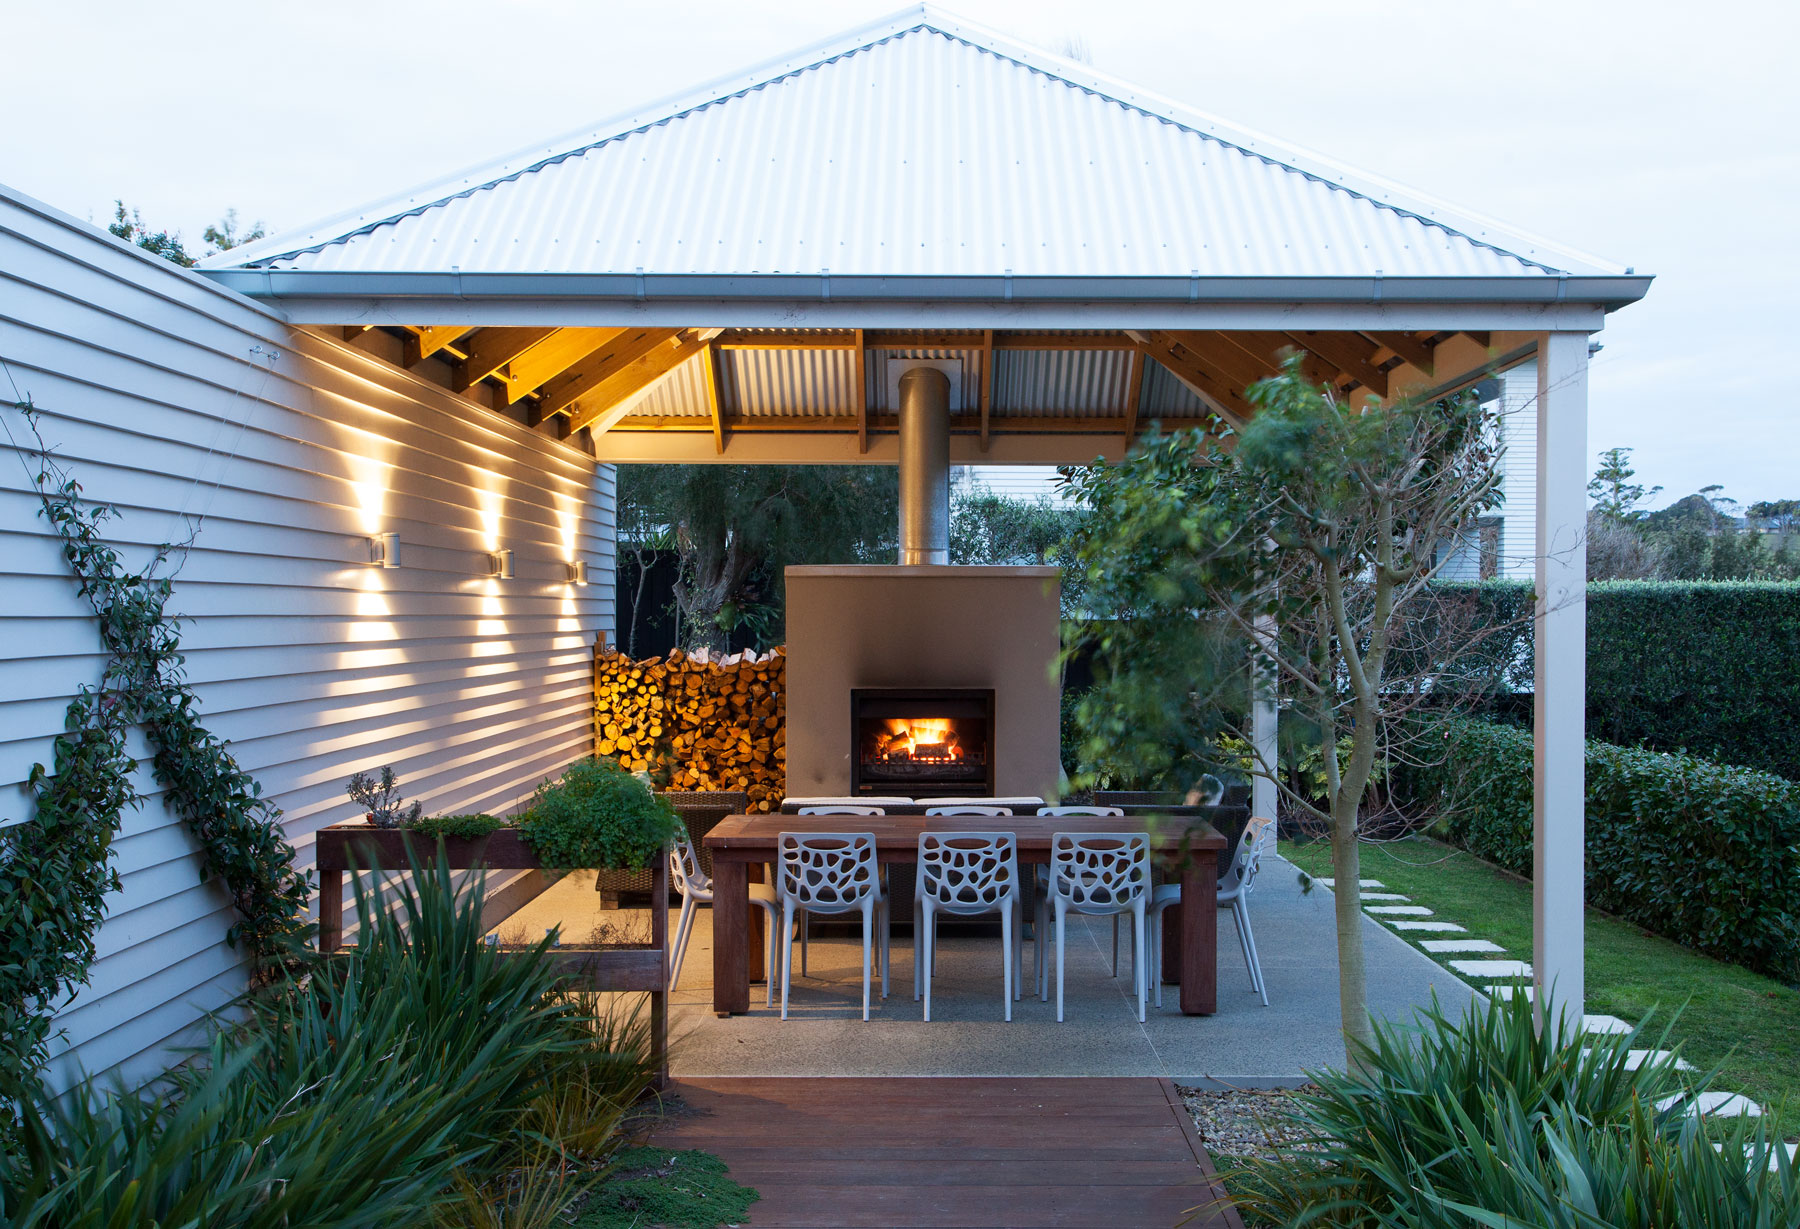 M-Leuschke-Kahn-Architects-Fireplace-IMG_3554.jpg